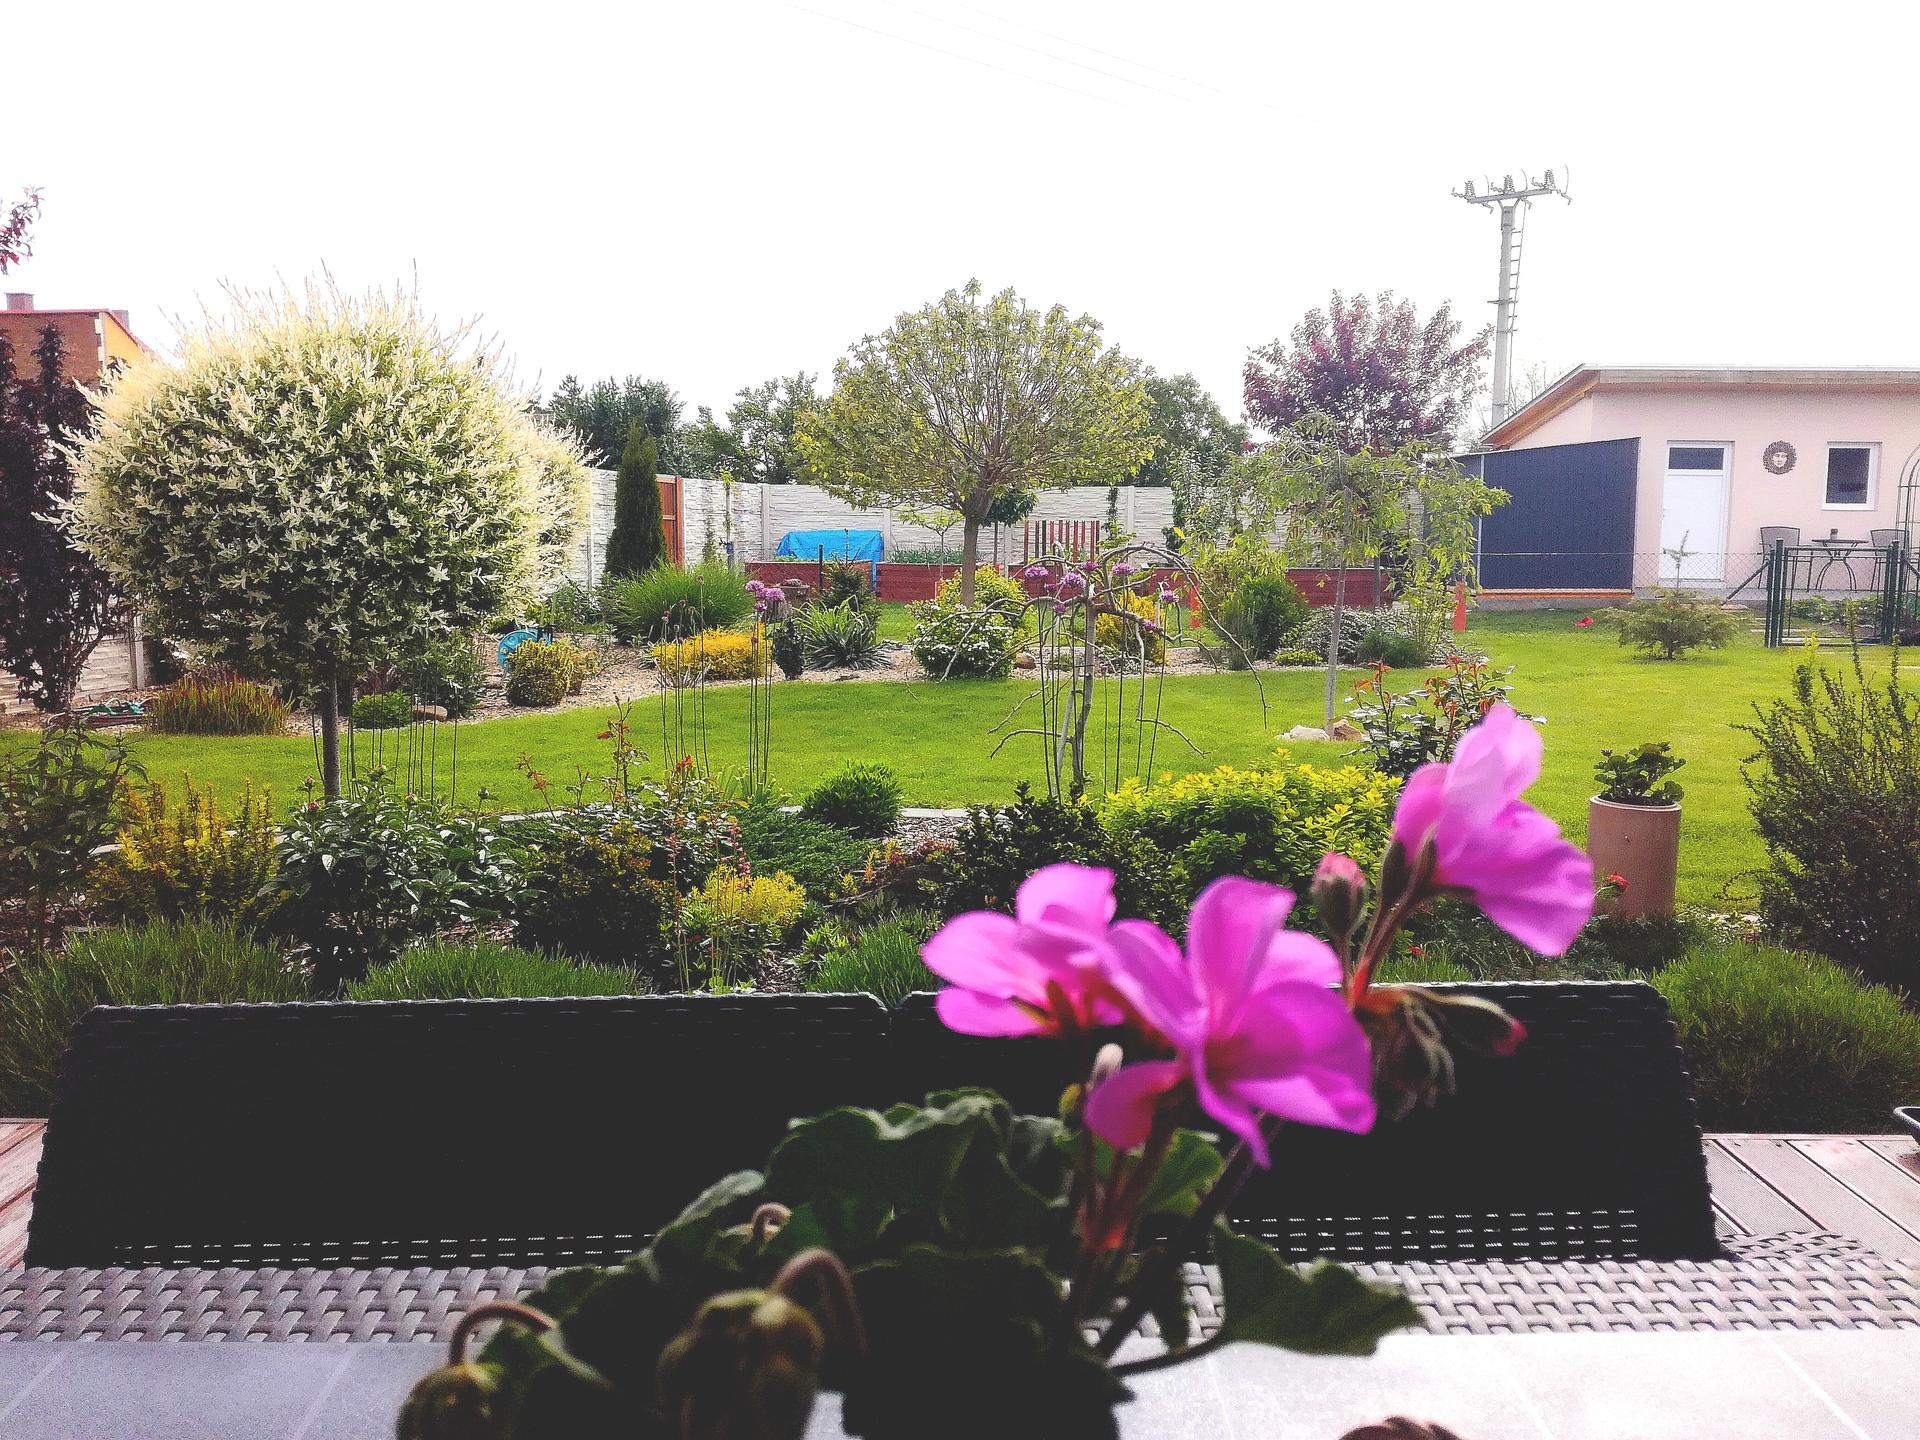 Zahrada 2021 🌲 - Obrázek č. 81